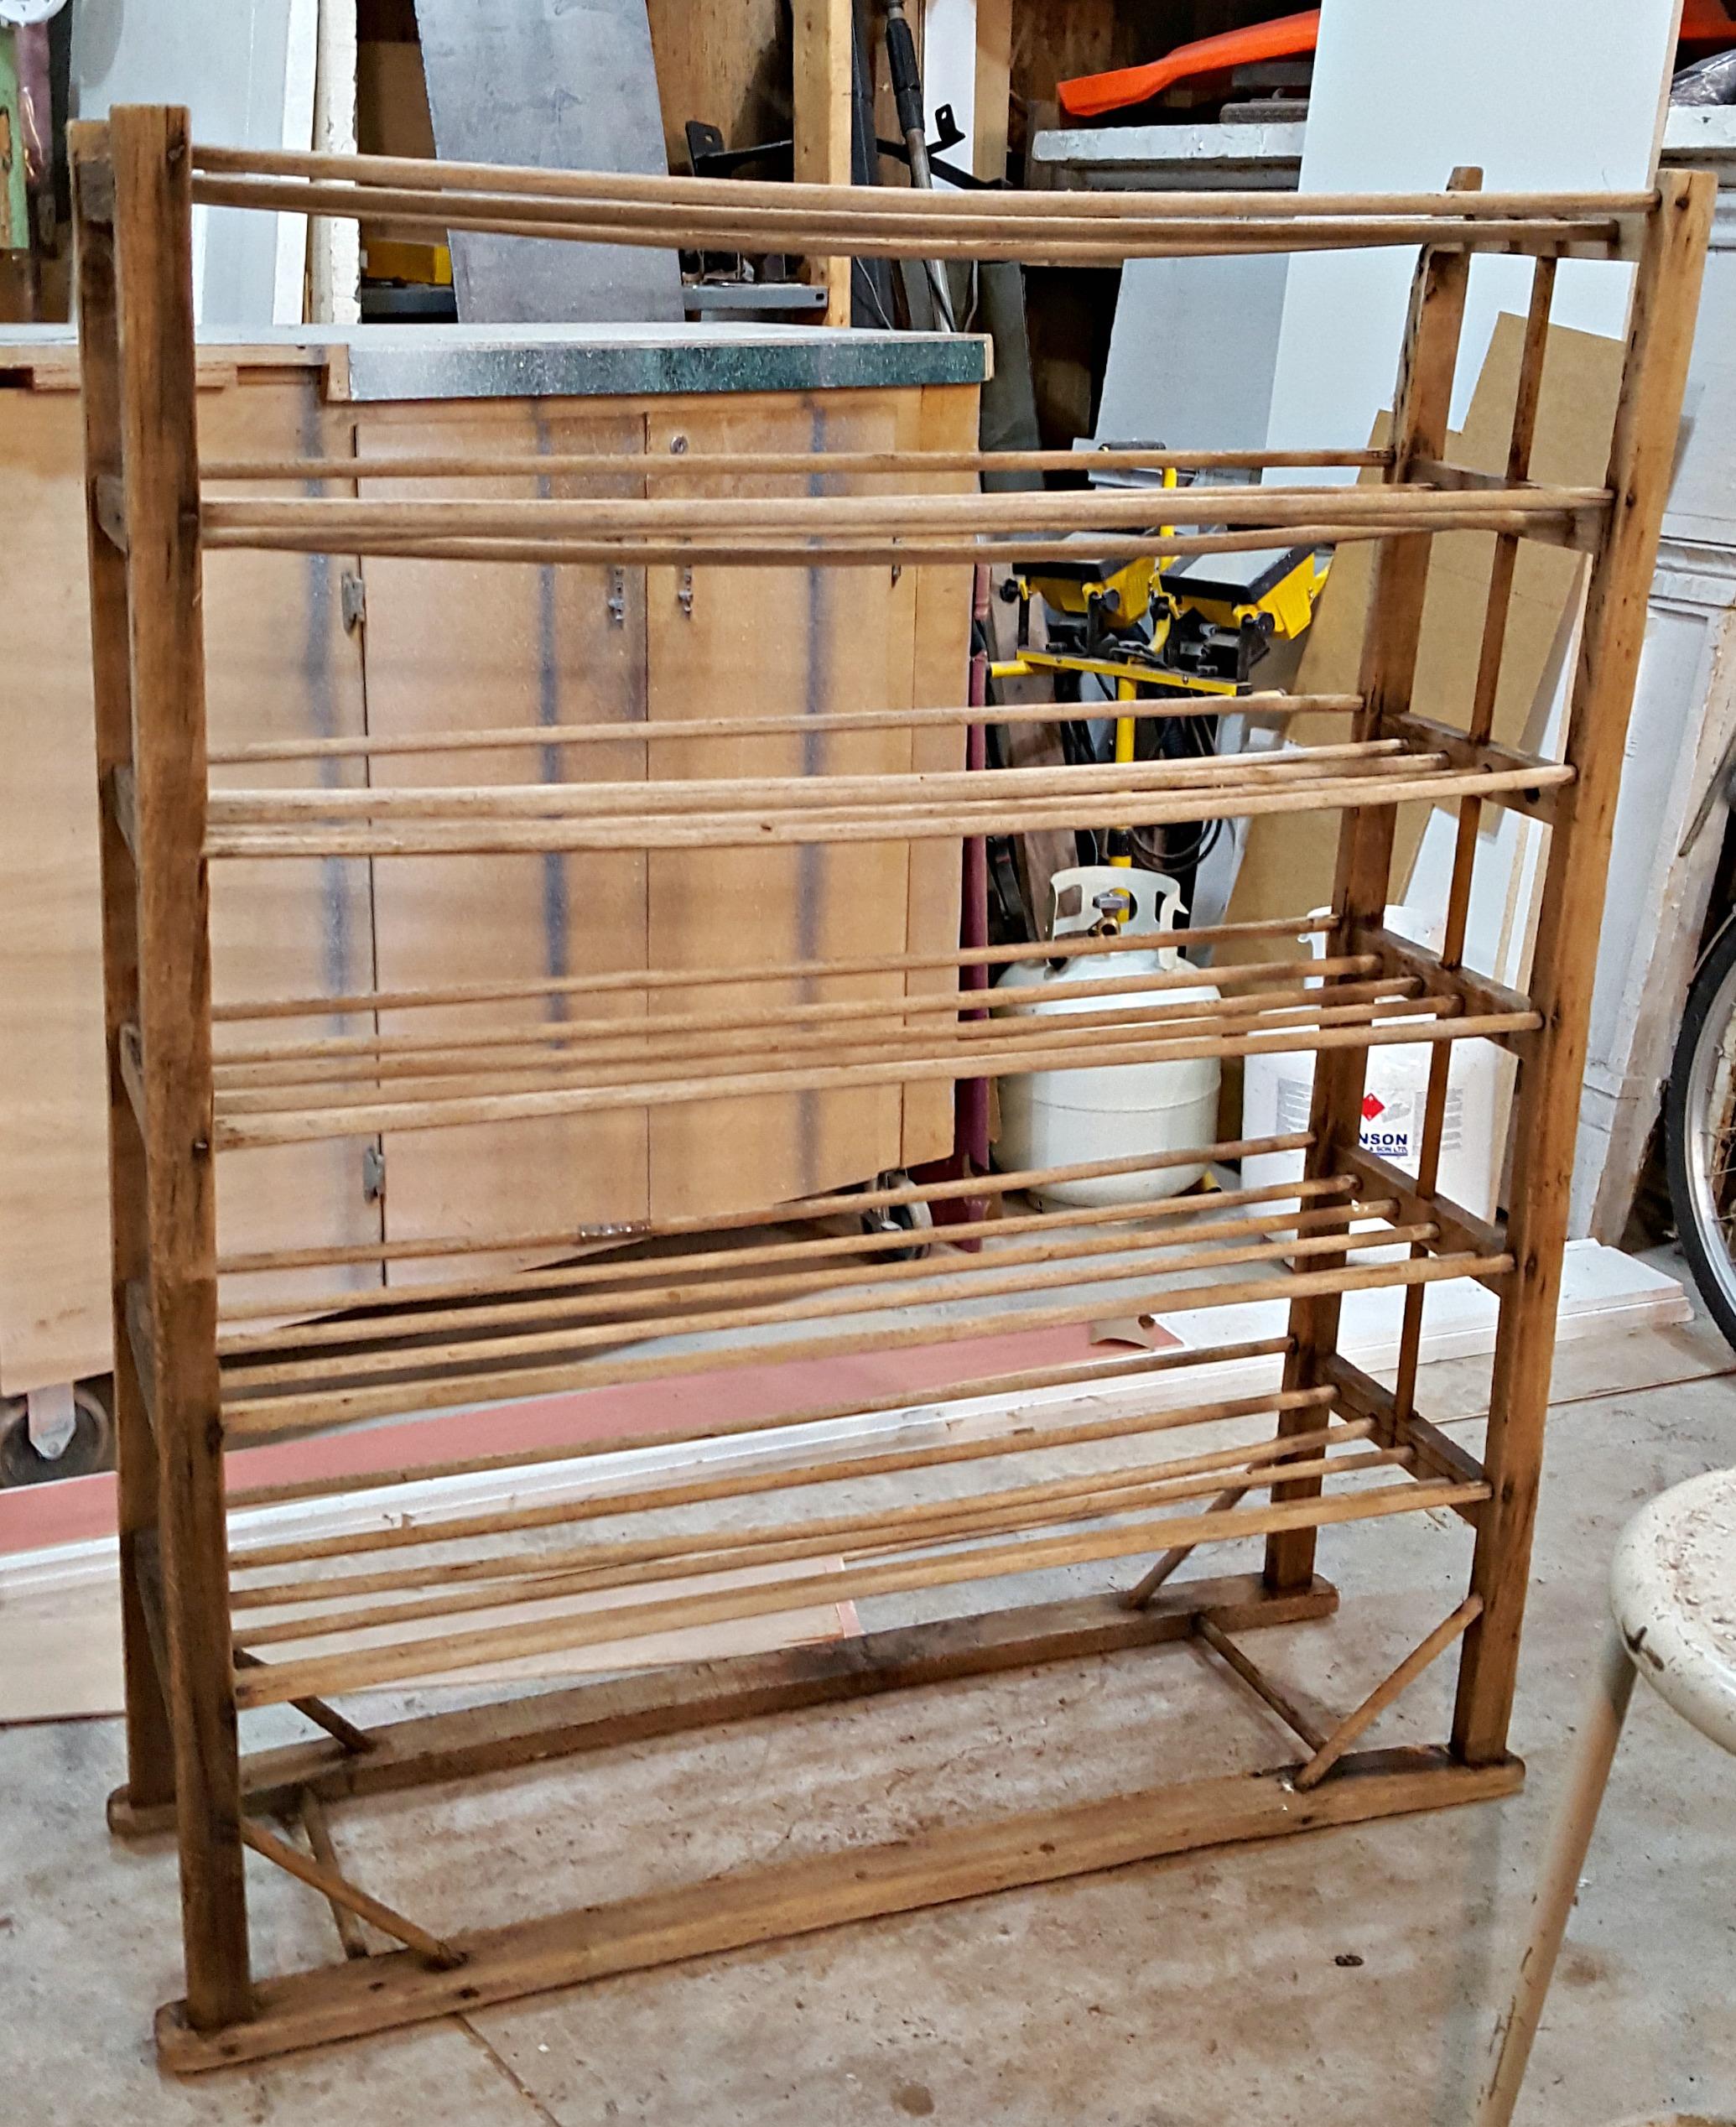 Repurposed antique bakers rack - Vin\'yet Etc.Vin\'yet Etc.